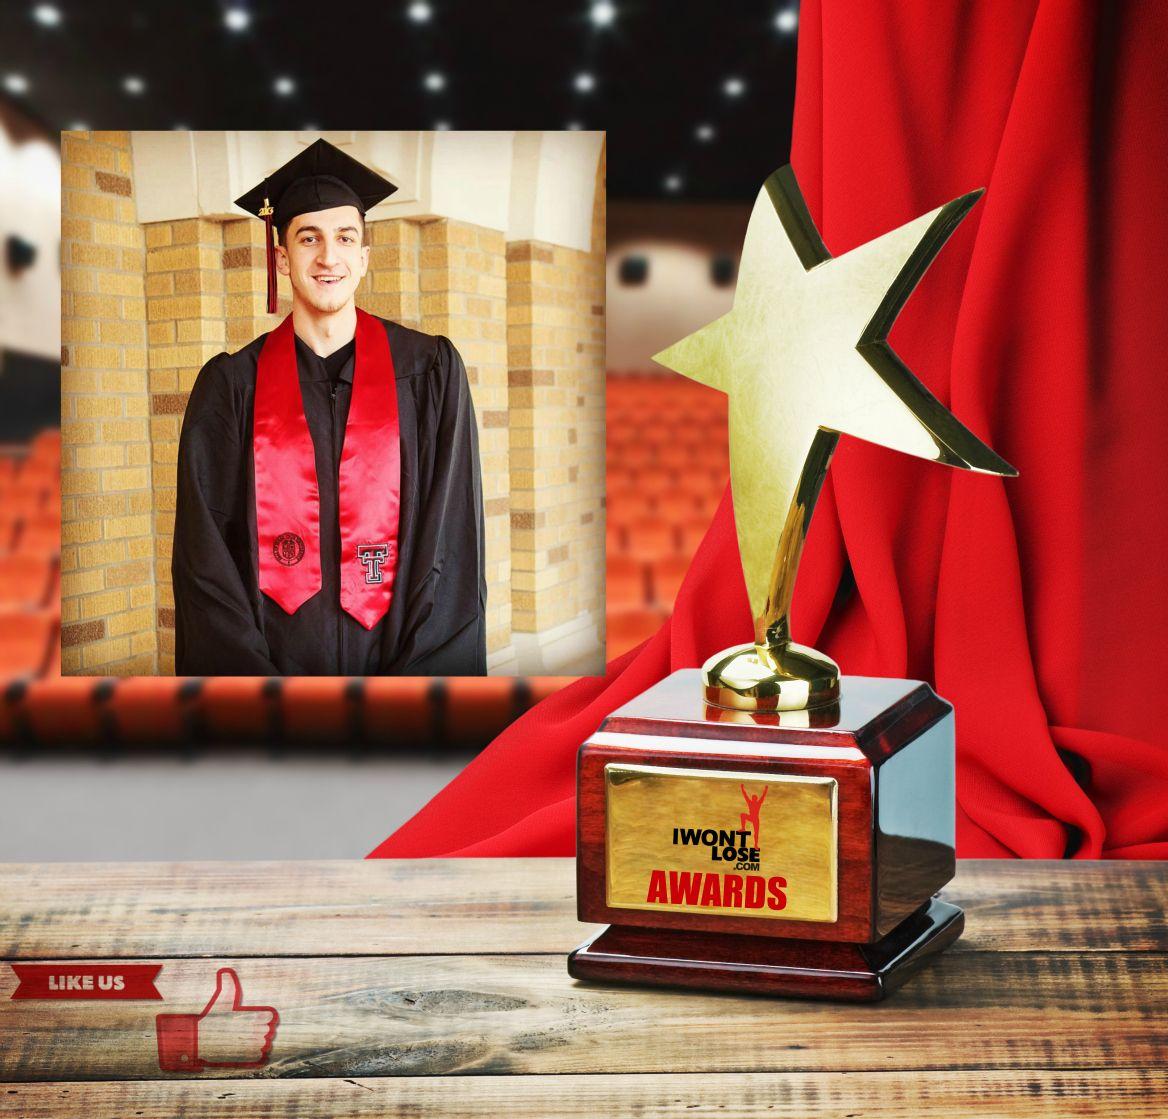 Awards 2 Dejan Kravic Dance major, Awards, Youth leader